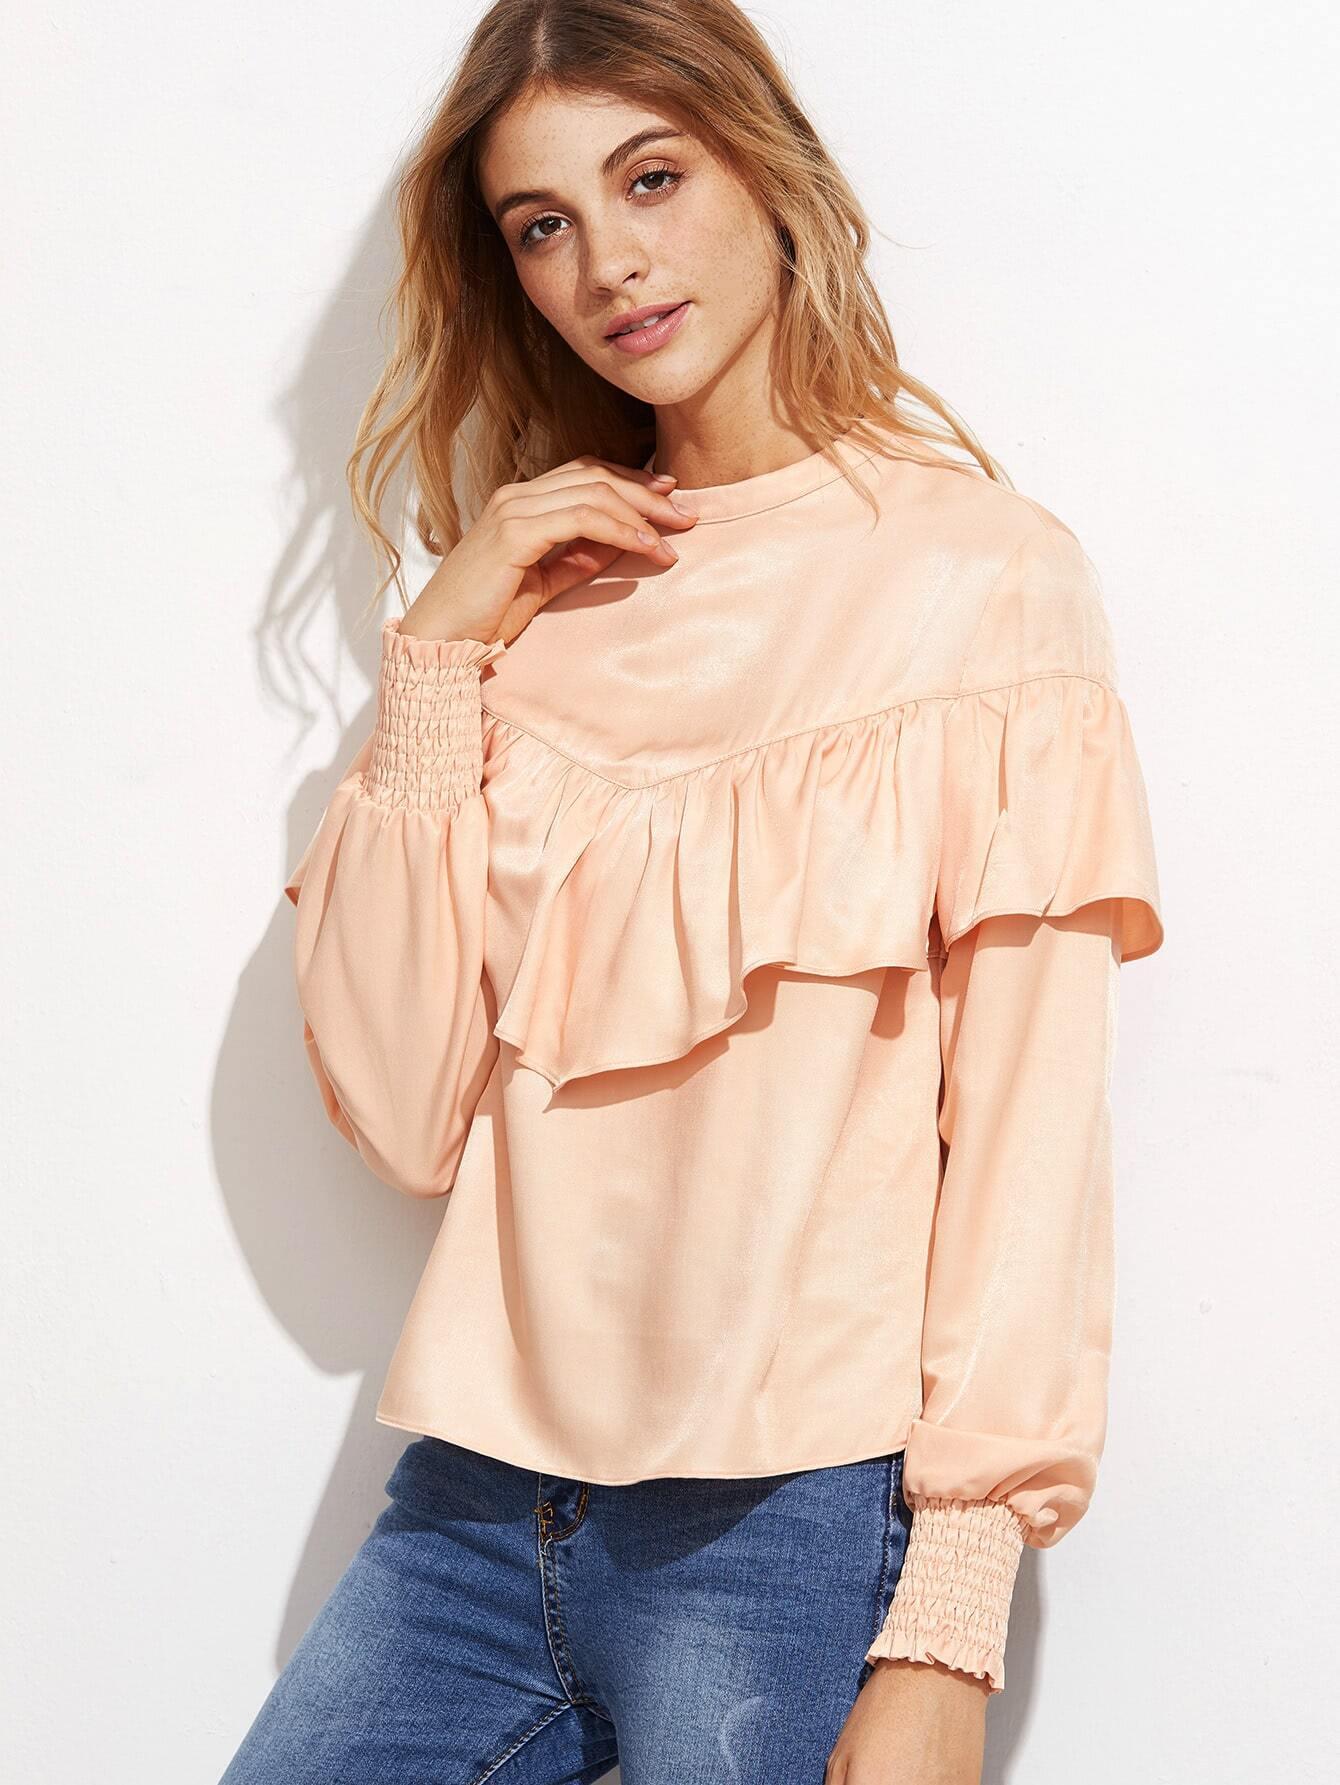 blouse161014706_2